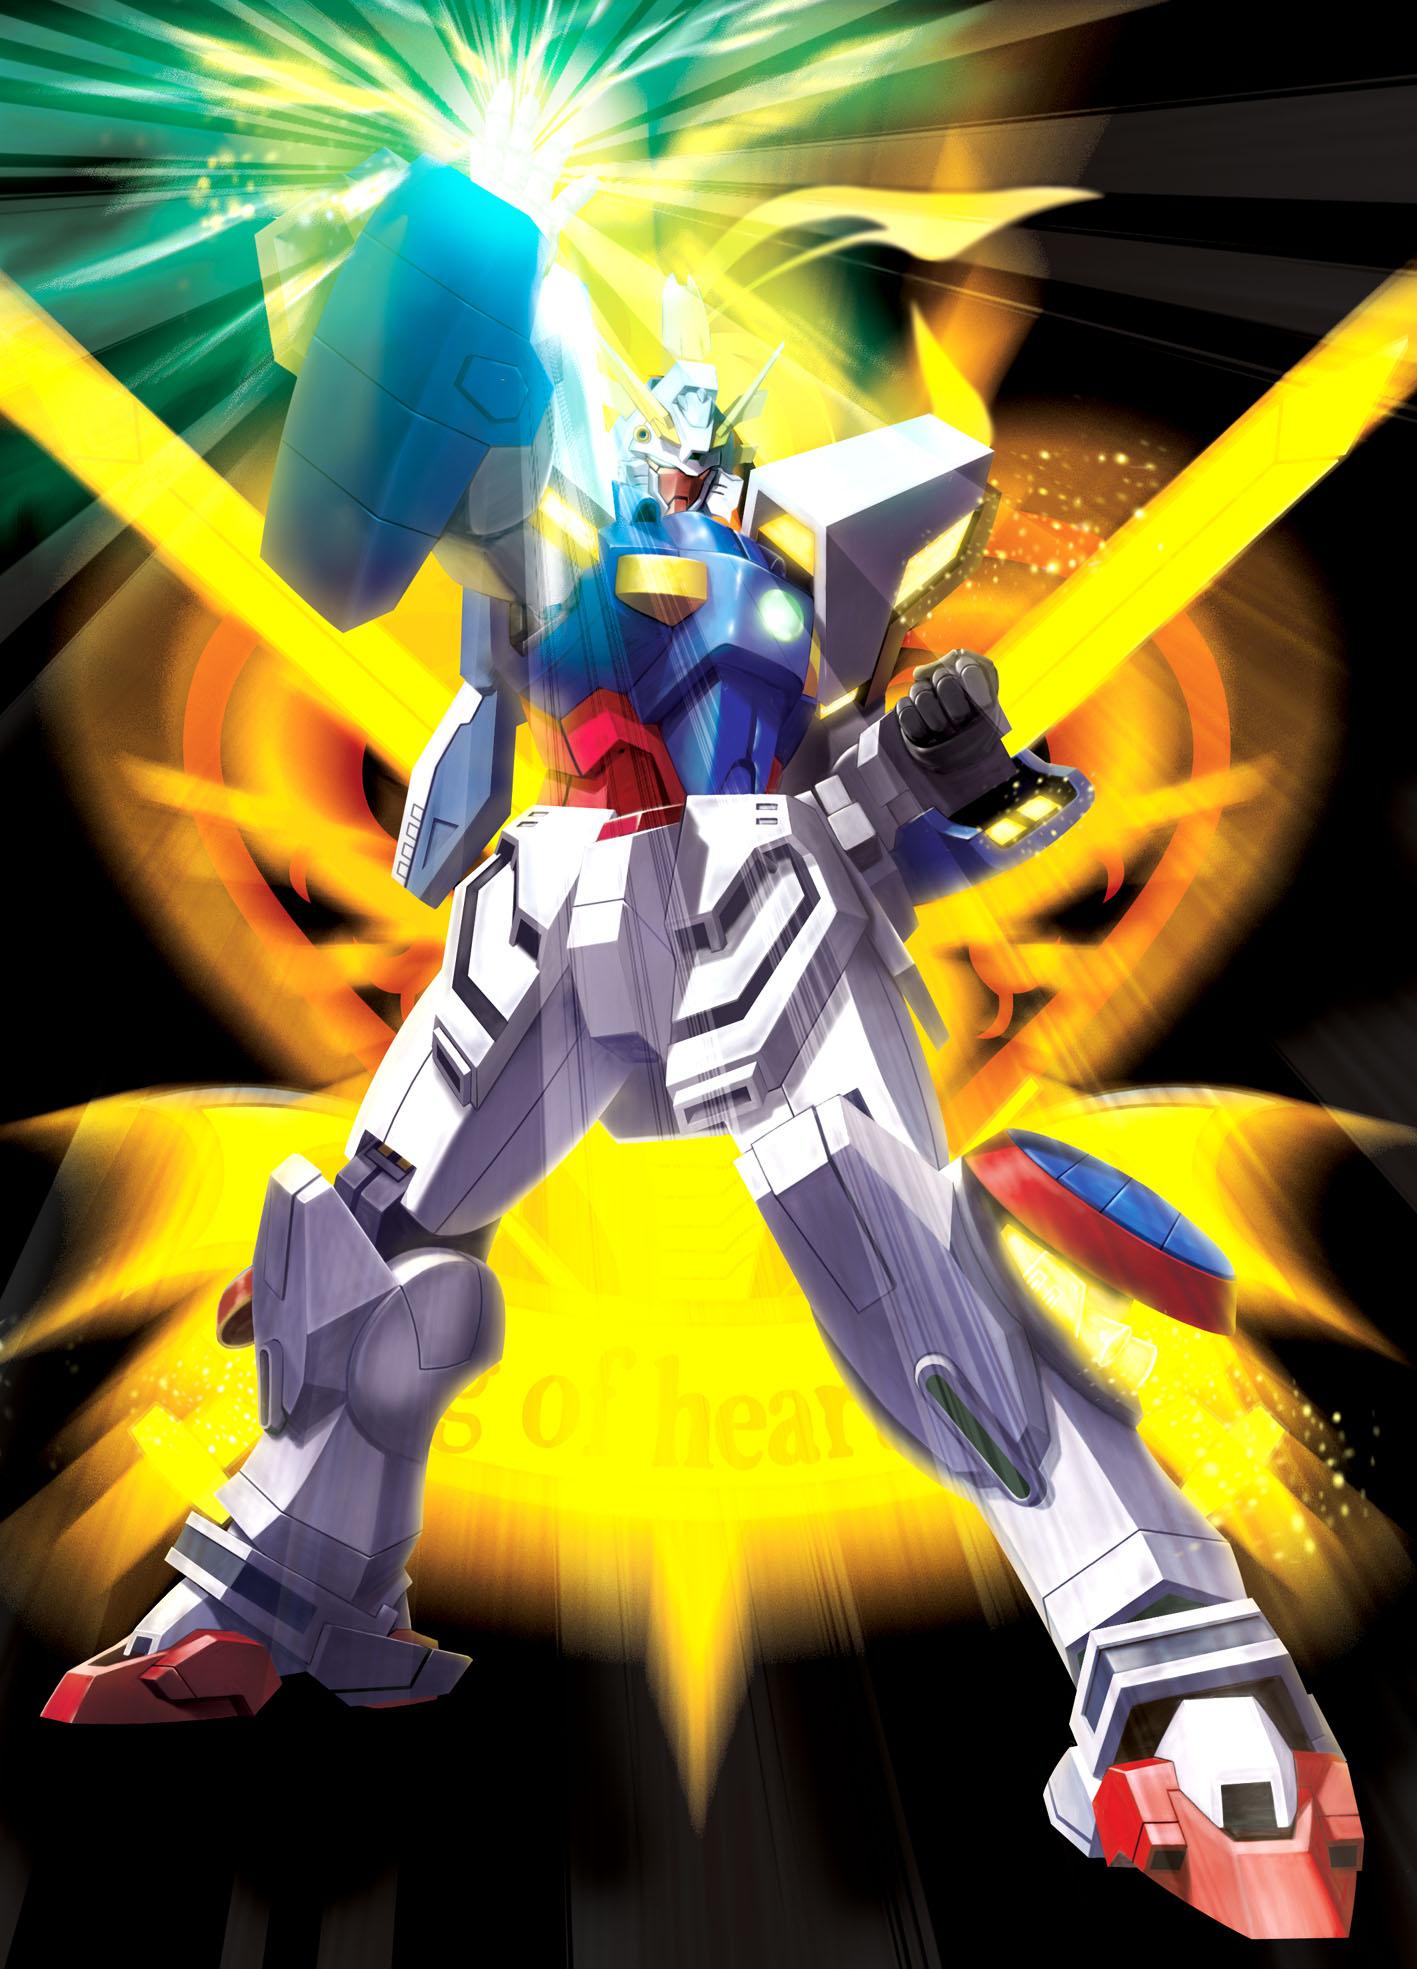 1 Fav Shining Gundam  G Gundam Shining Gundam